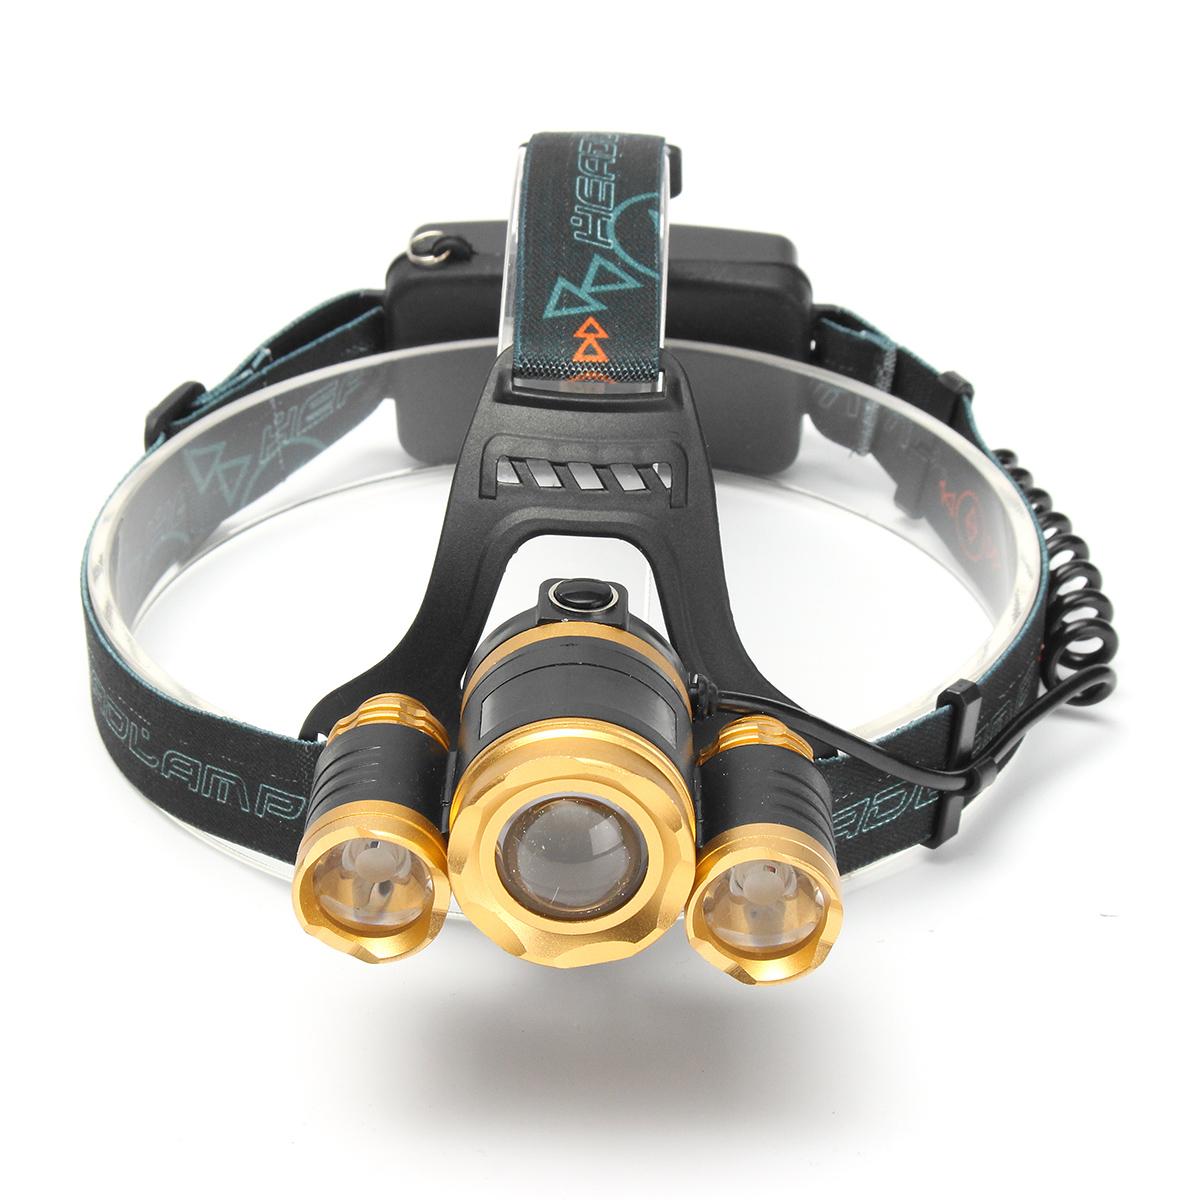 Elfeland 6000Lumens 3xT6 LED Zoomable Rechargeable Headlamp Headlight Flashlight Torch Waterproof 3 Modes (Just Headlamp)